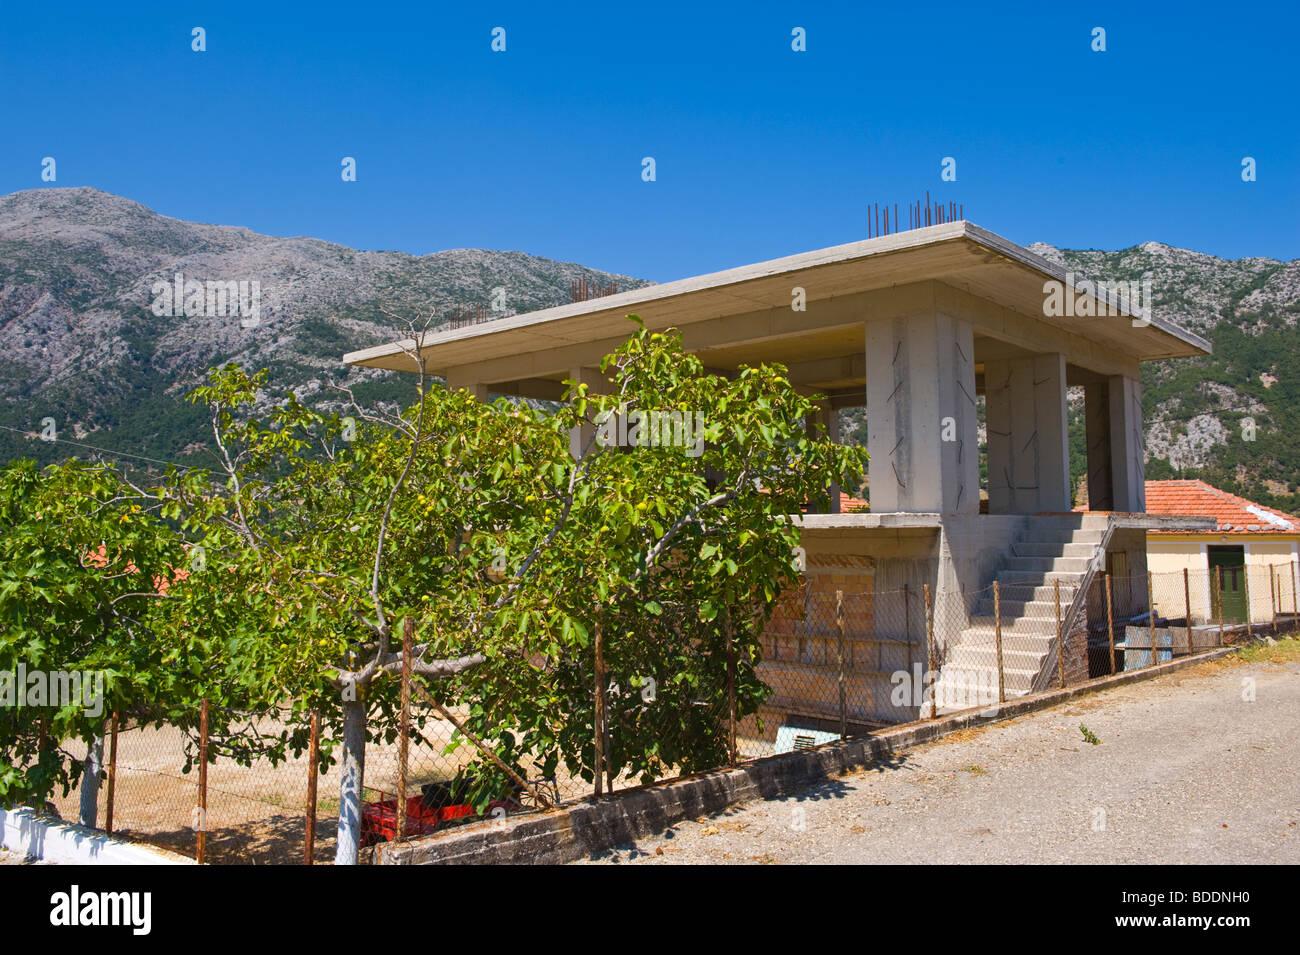 House under construction in the rural village of Agios Nikolaos on the Greek island of Kefalonia Greece GR Stock Photo